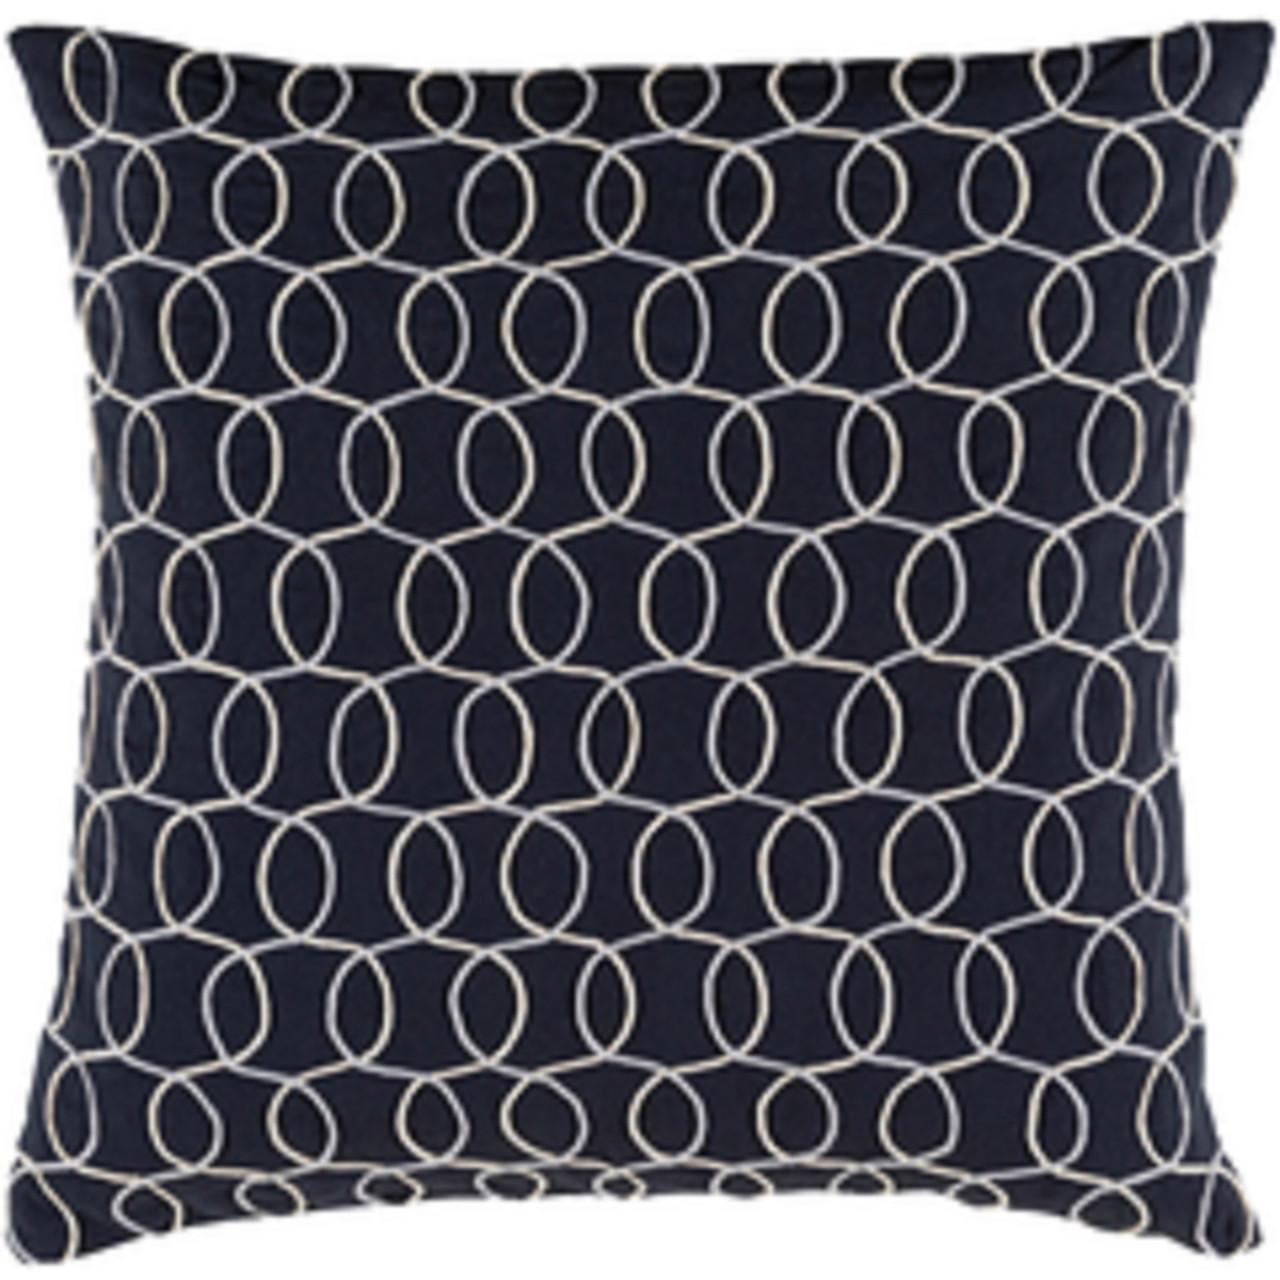 Black Down Throw Pillows : 20